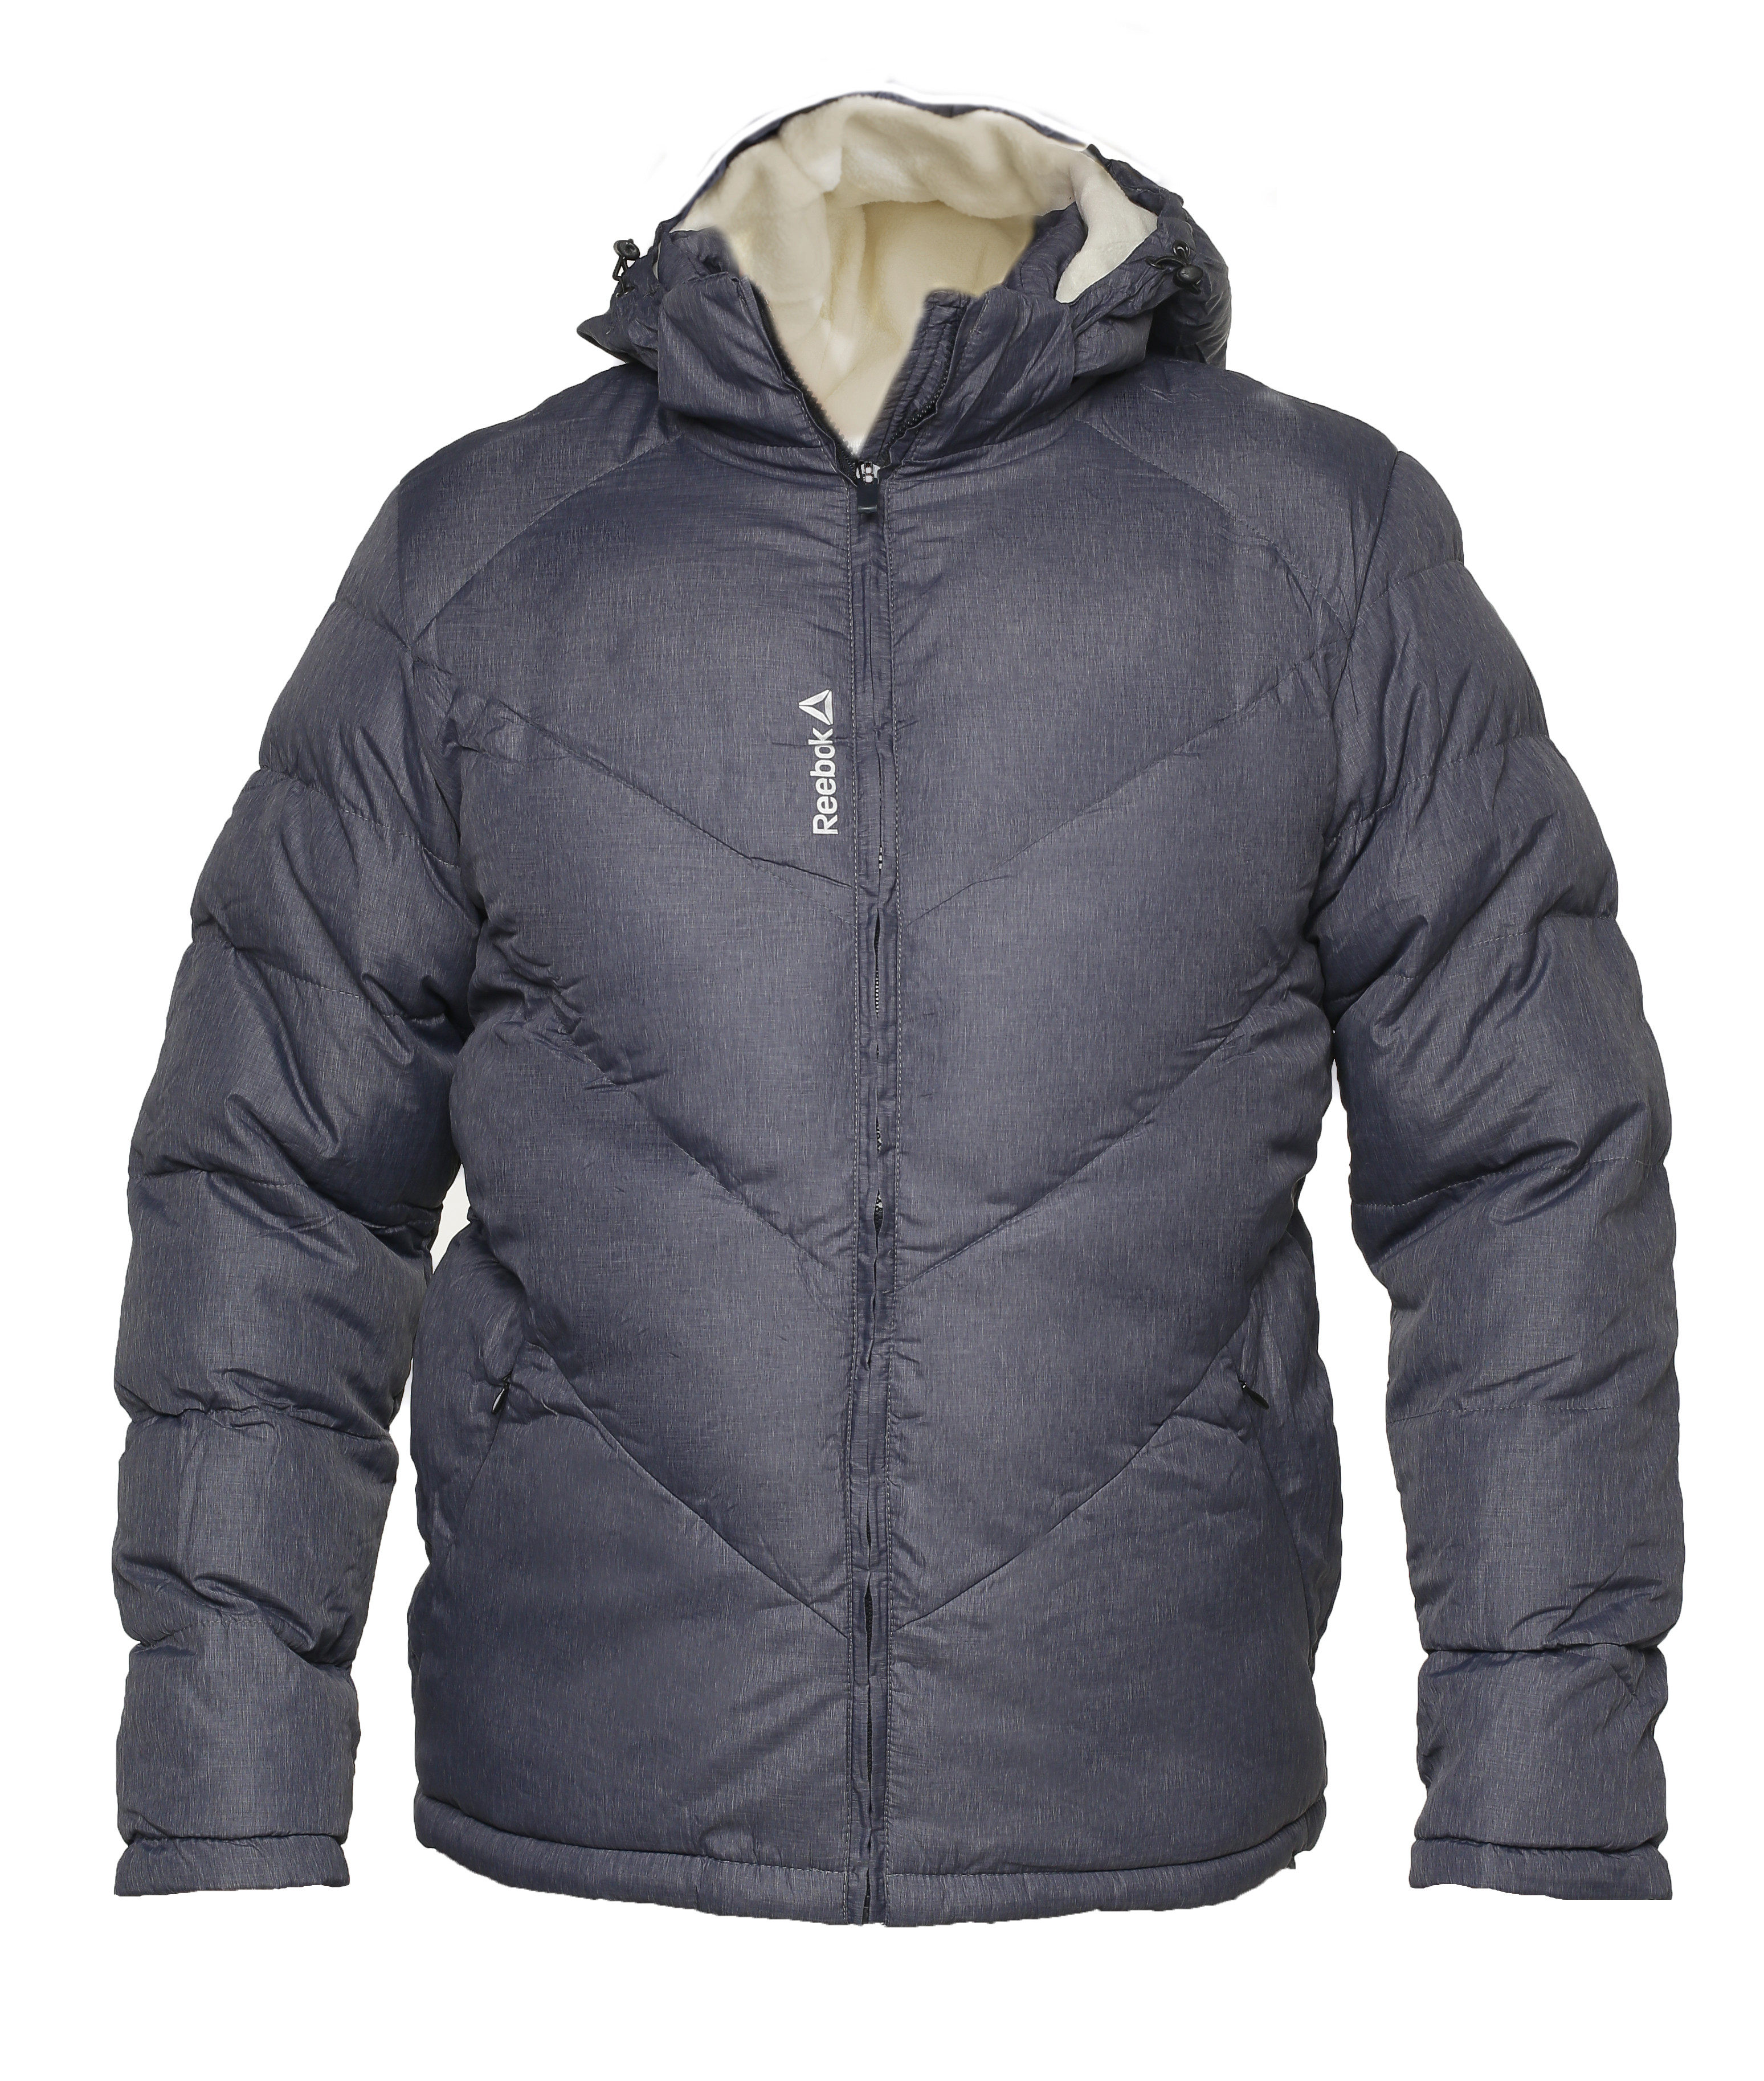 Утепленная куртка reebok crossfit grey k319